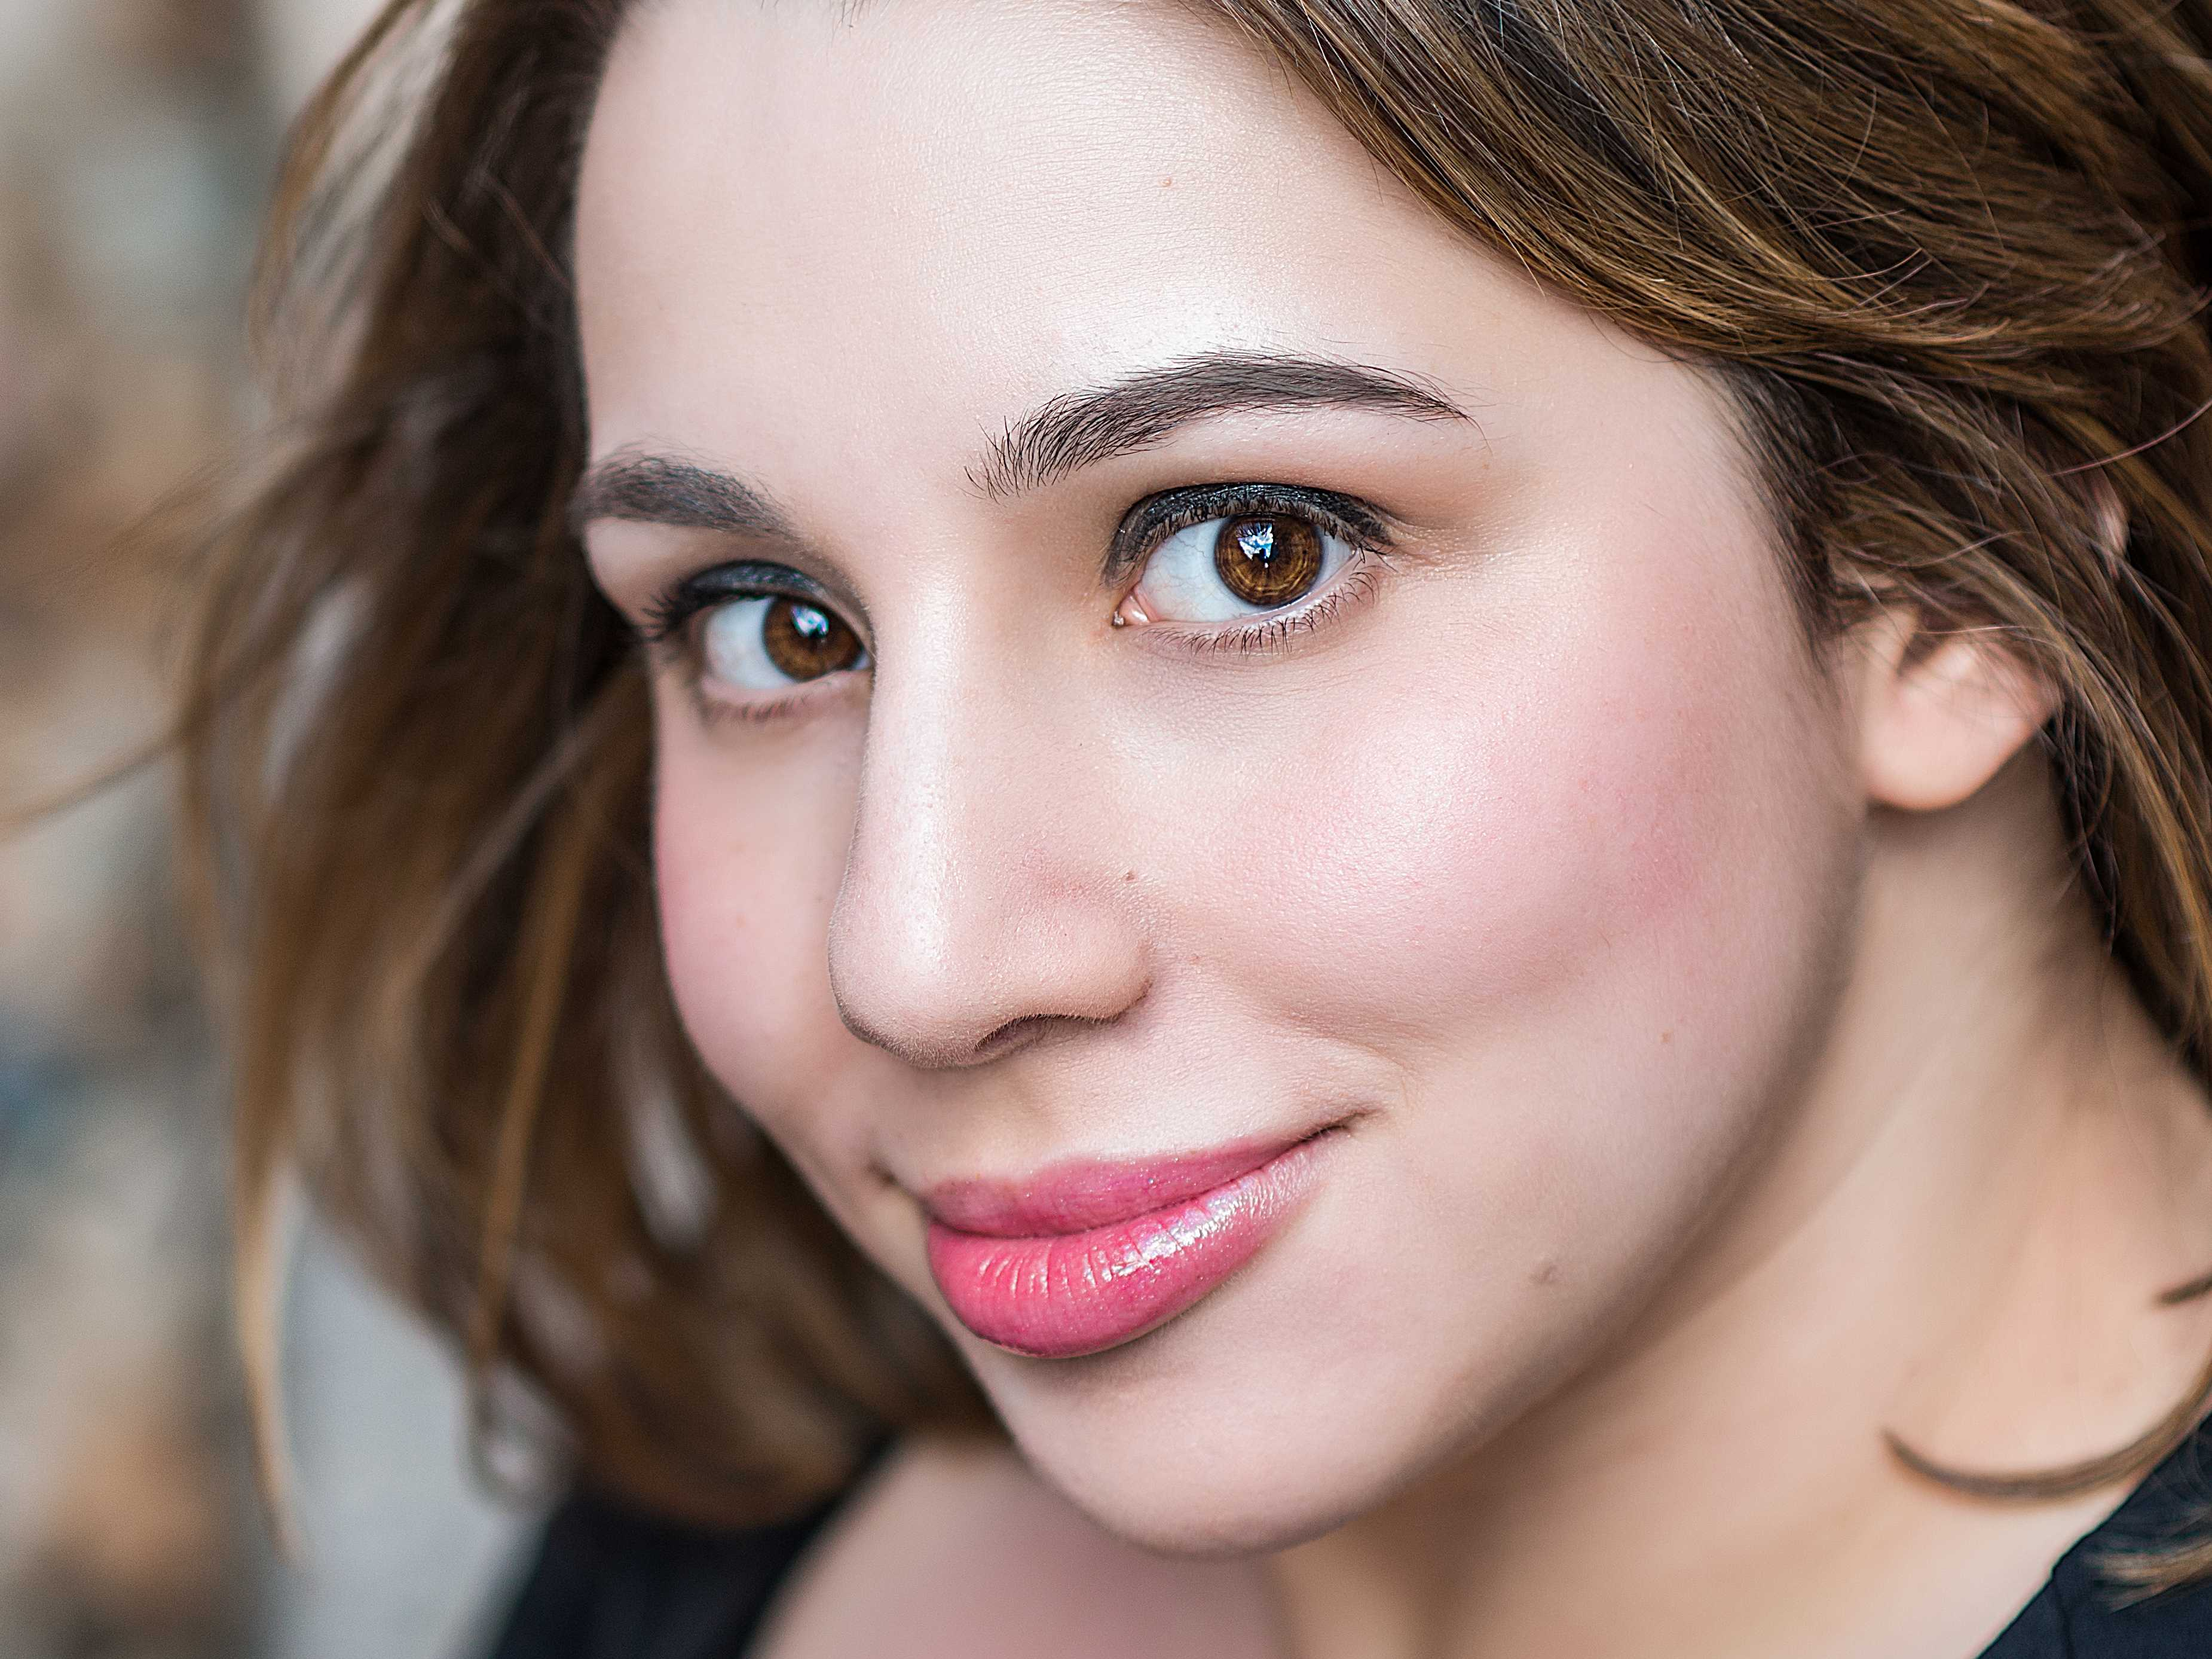 'Body' of Work :: Hub Theatre's Lauren Elias on Playing Eve Ensler